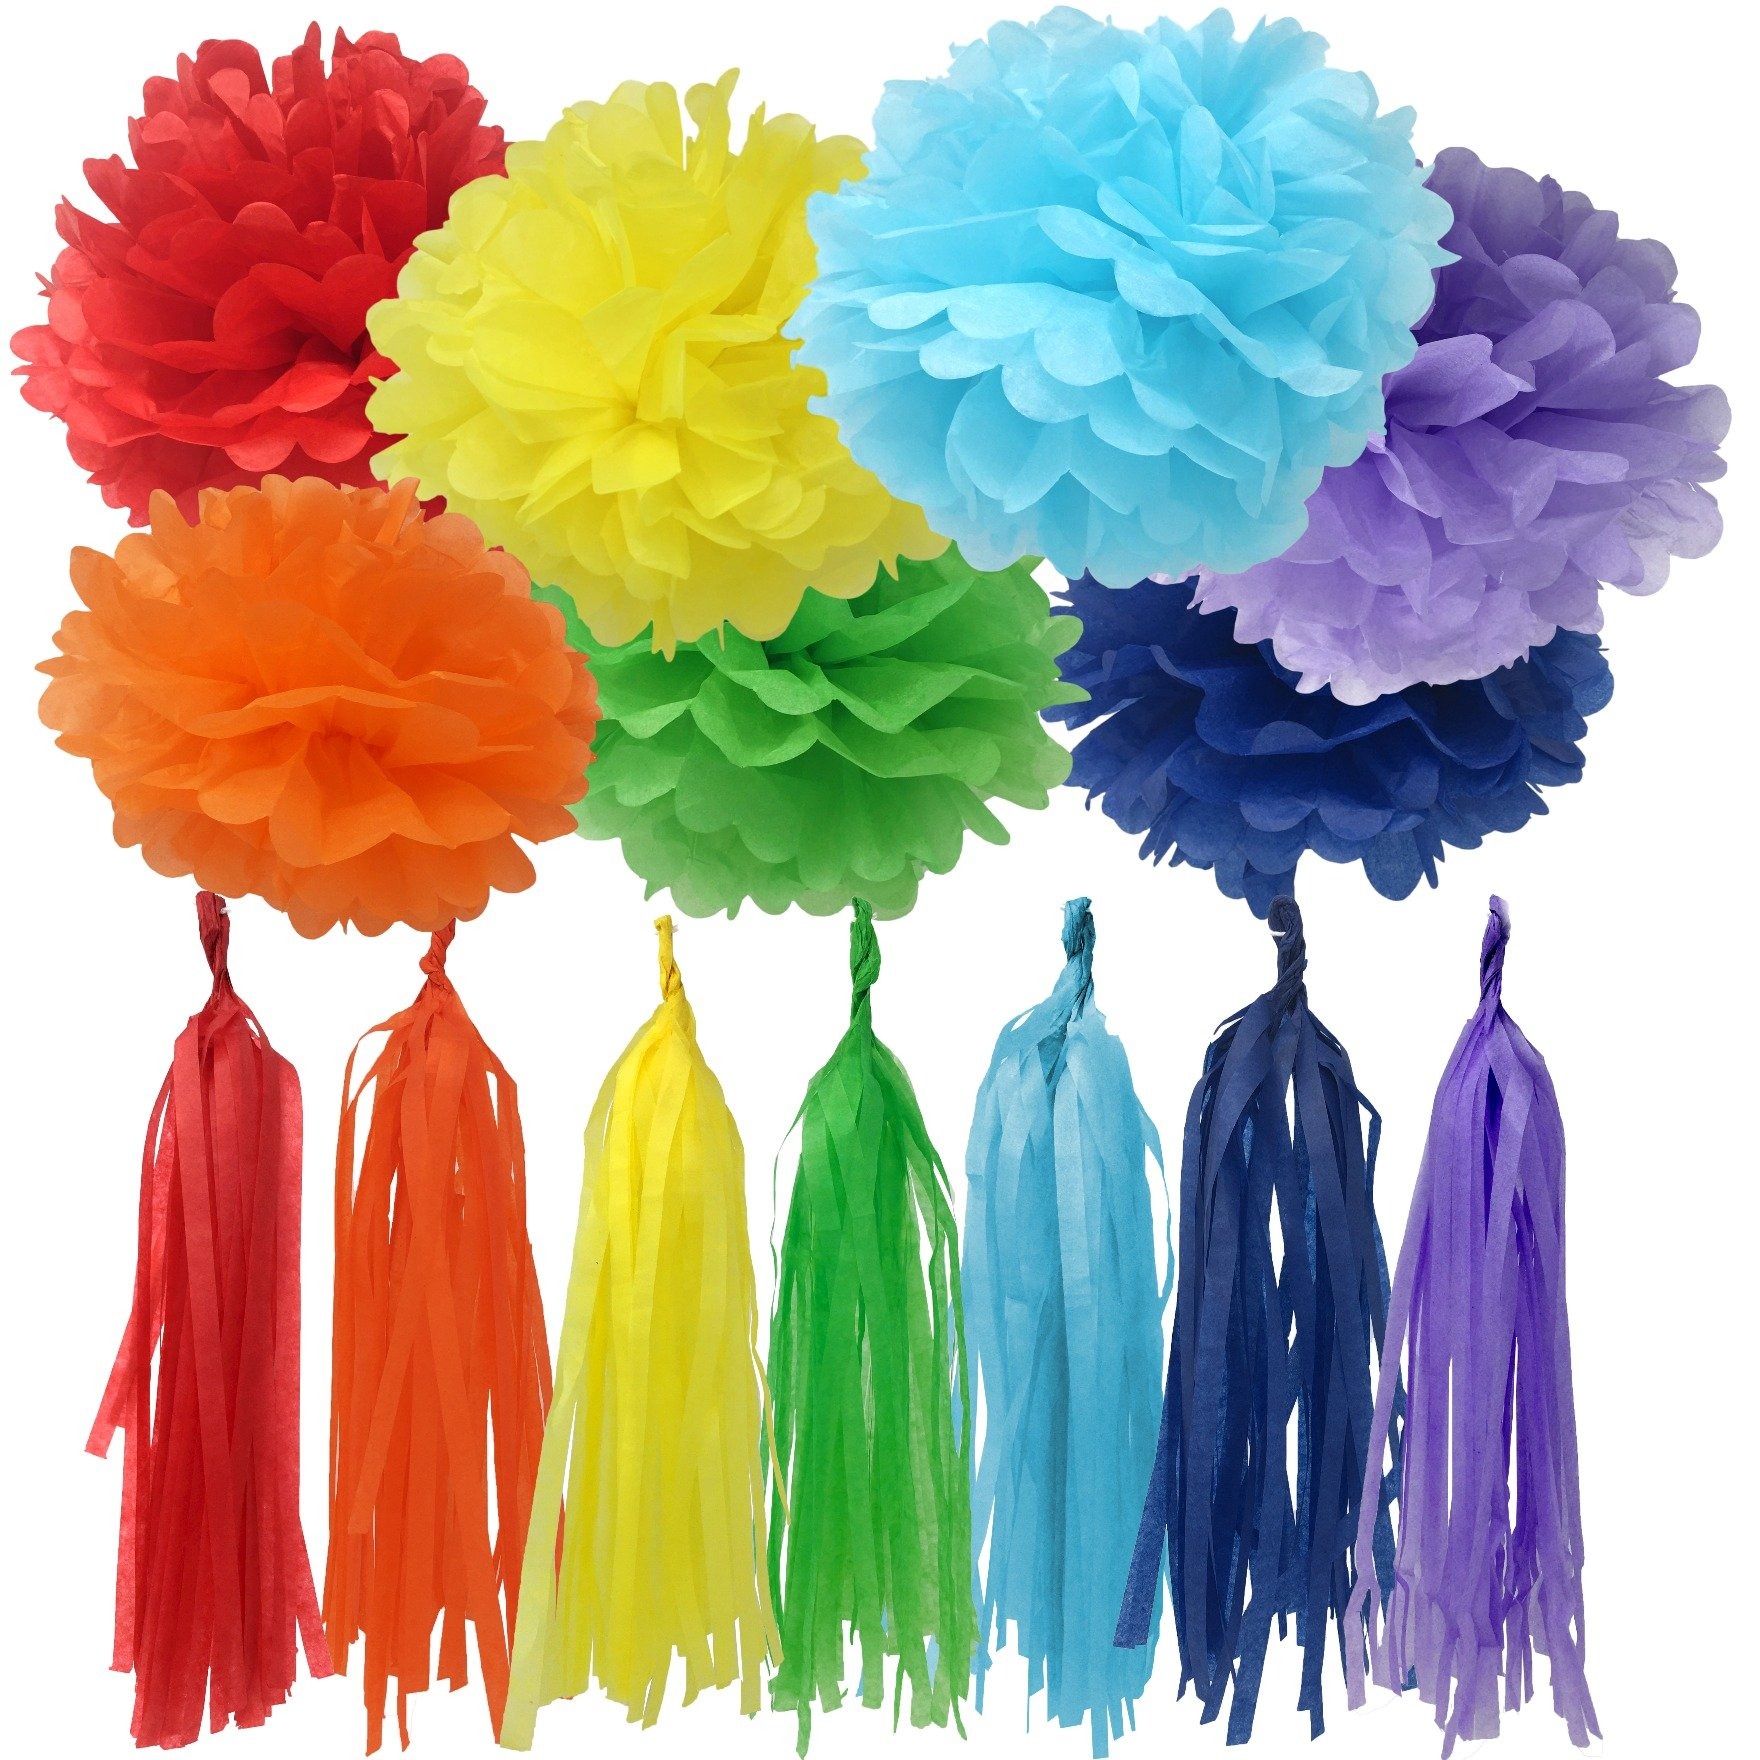 Bobee Rainbow Party Decorations 42 Piece Rainbow DIY Pom Poms and Tassel Garland